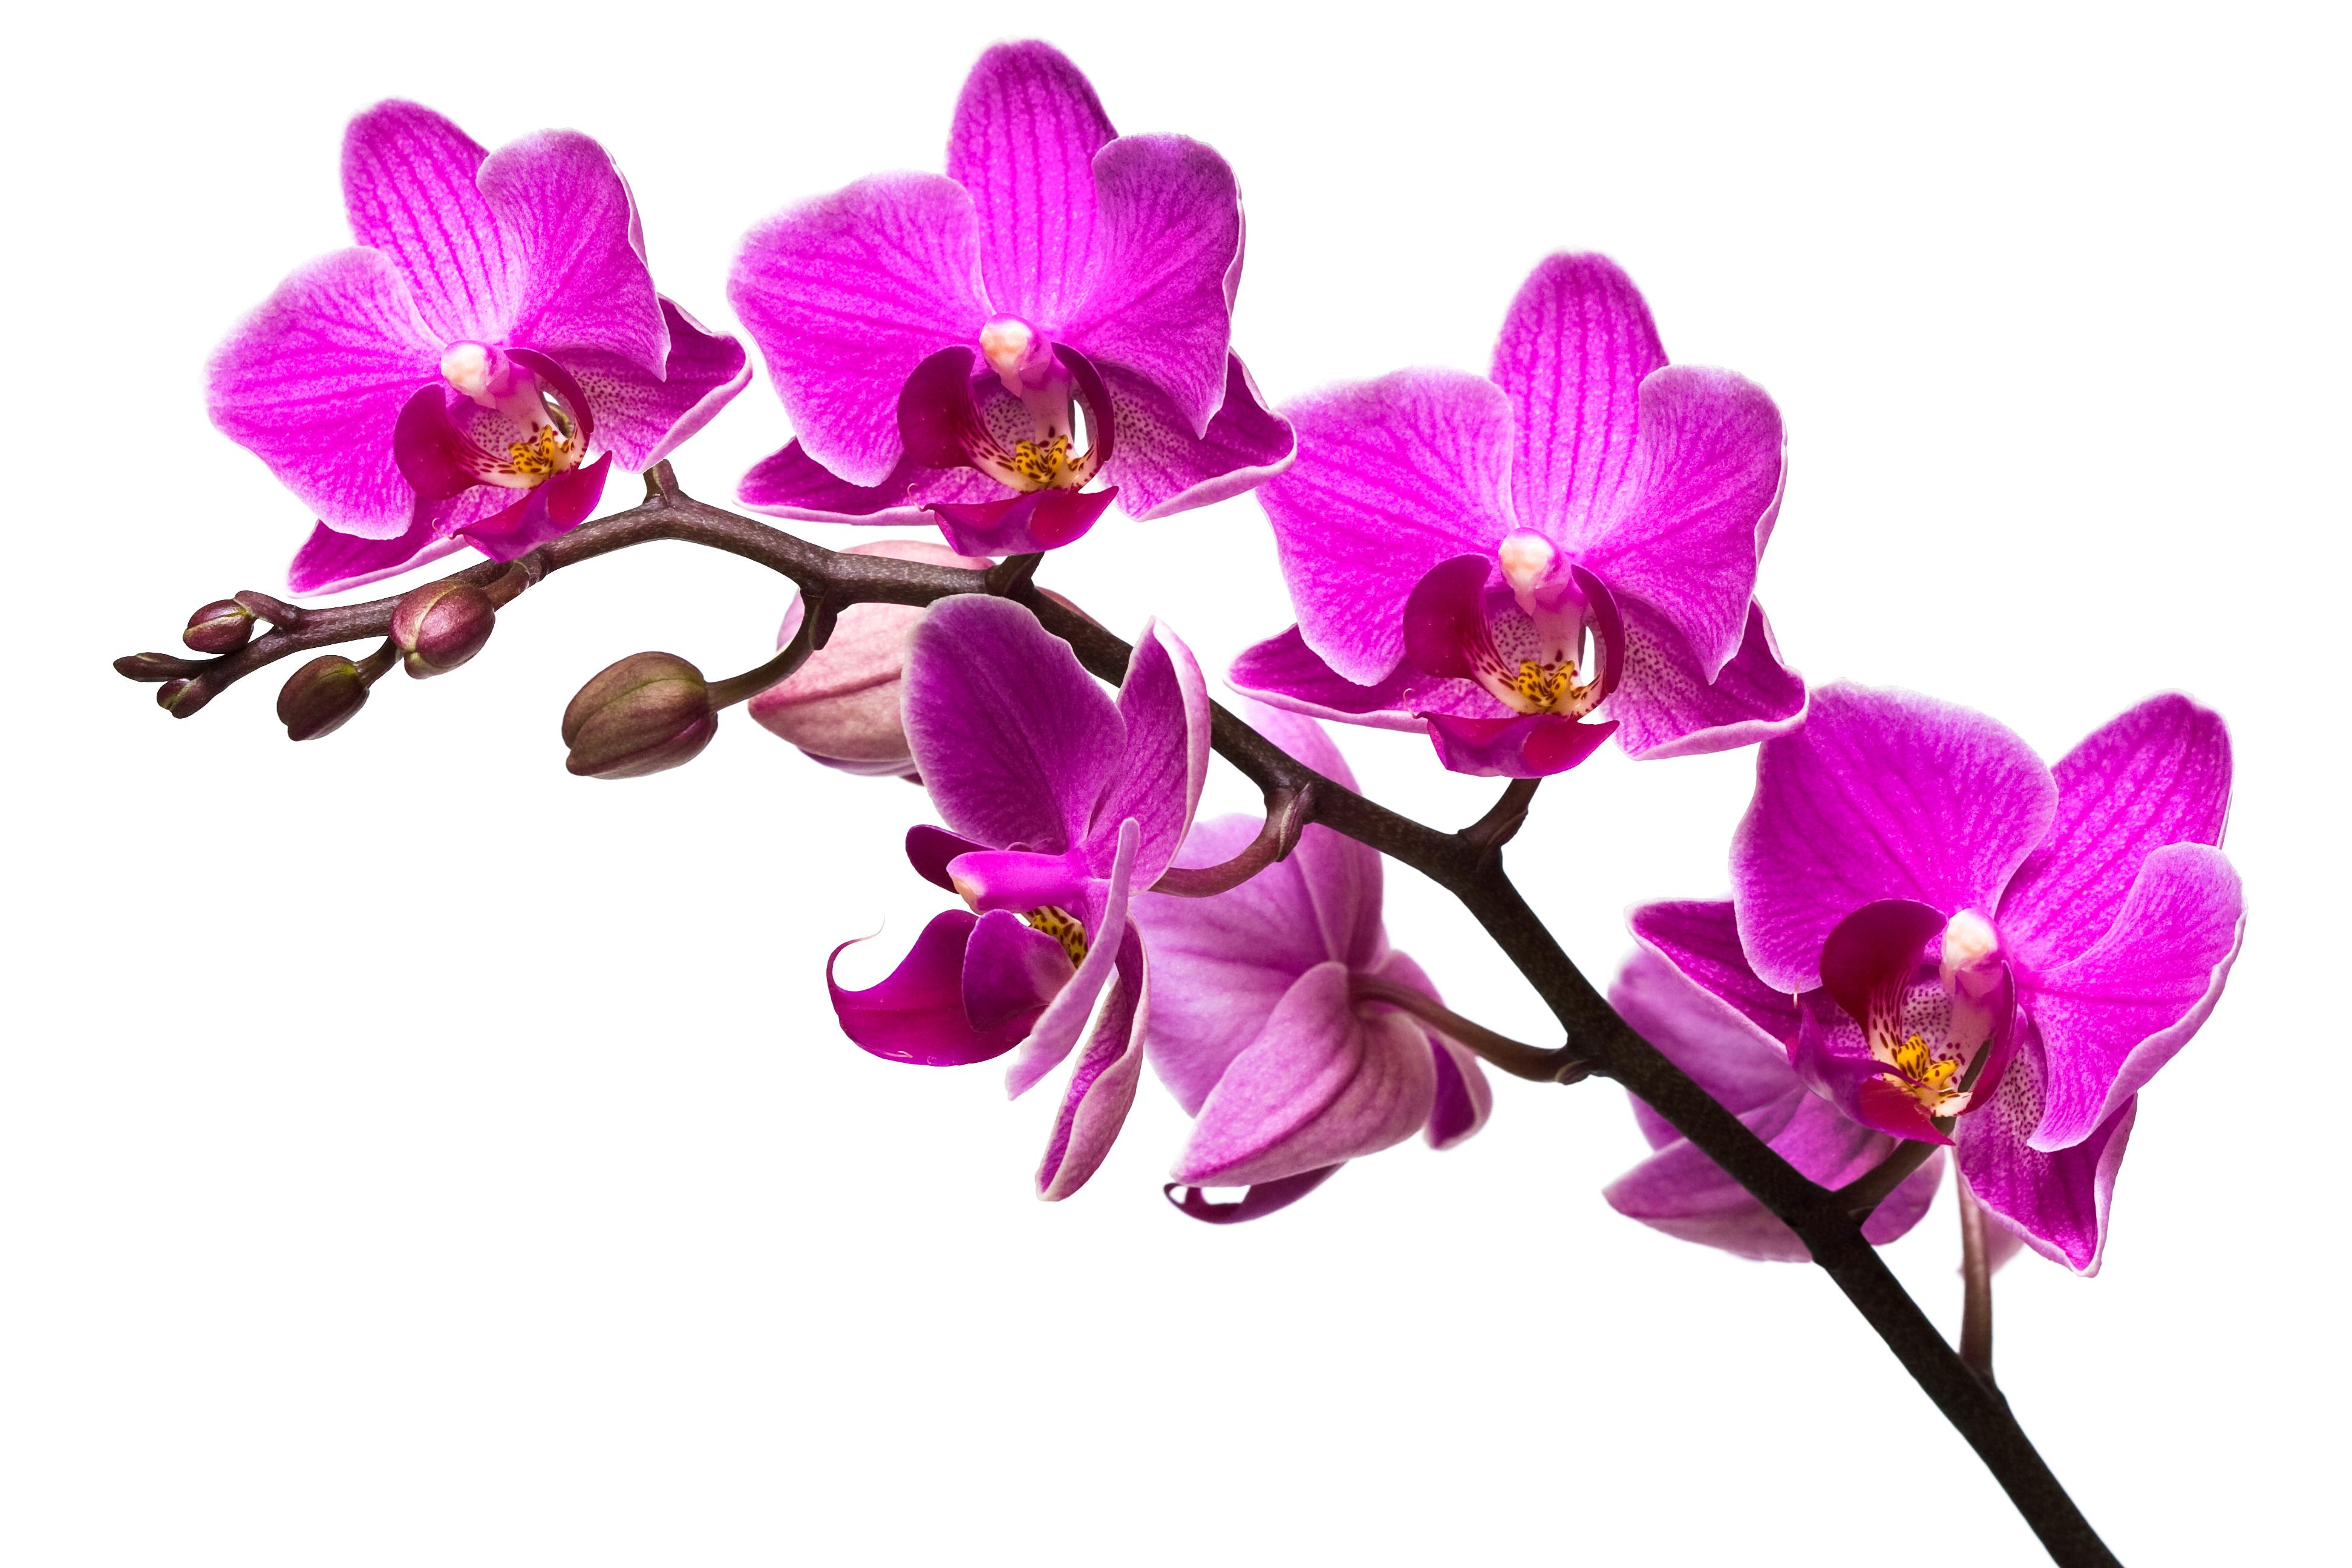 Orchid flowers transparent background clipart.